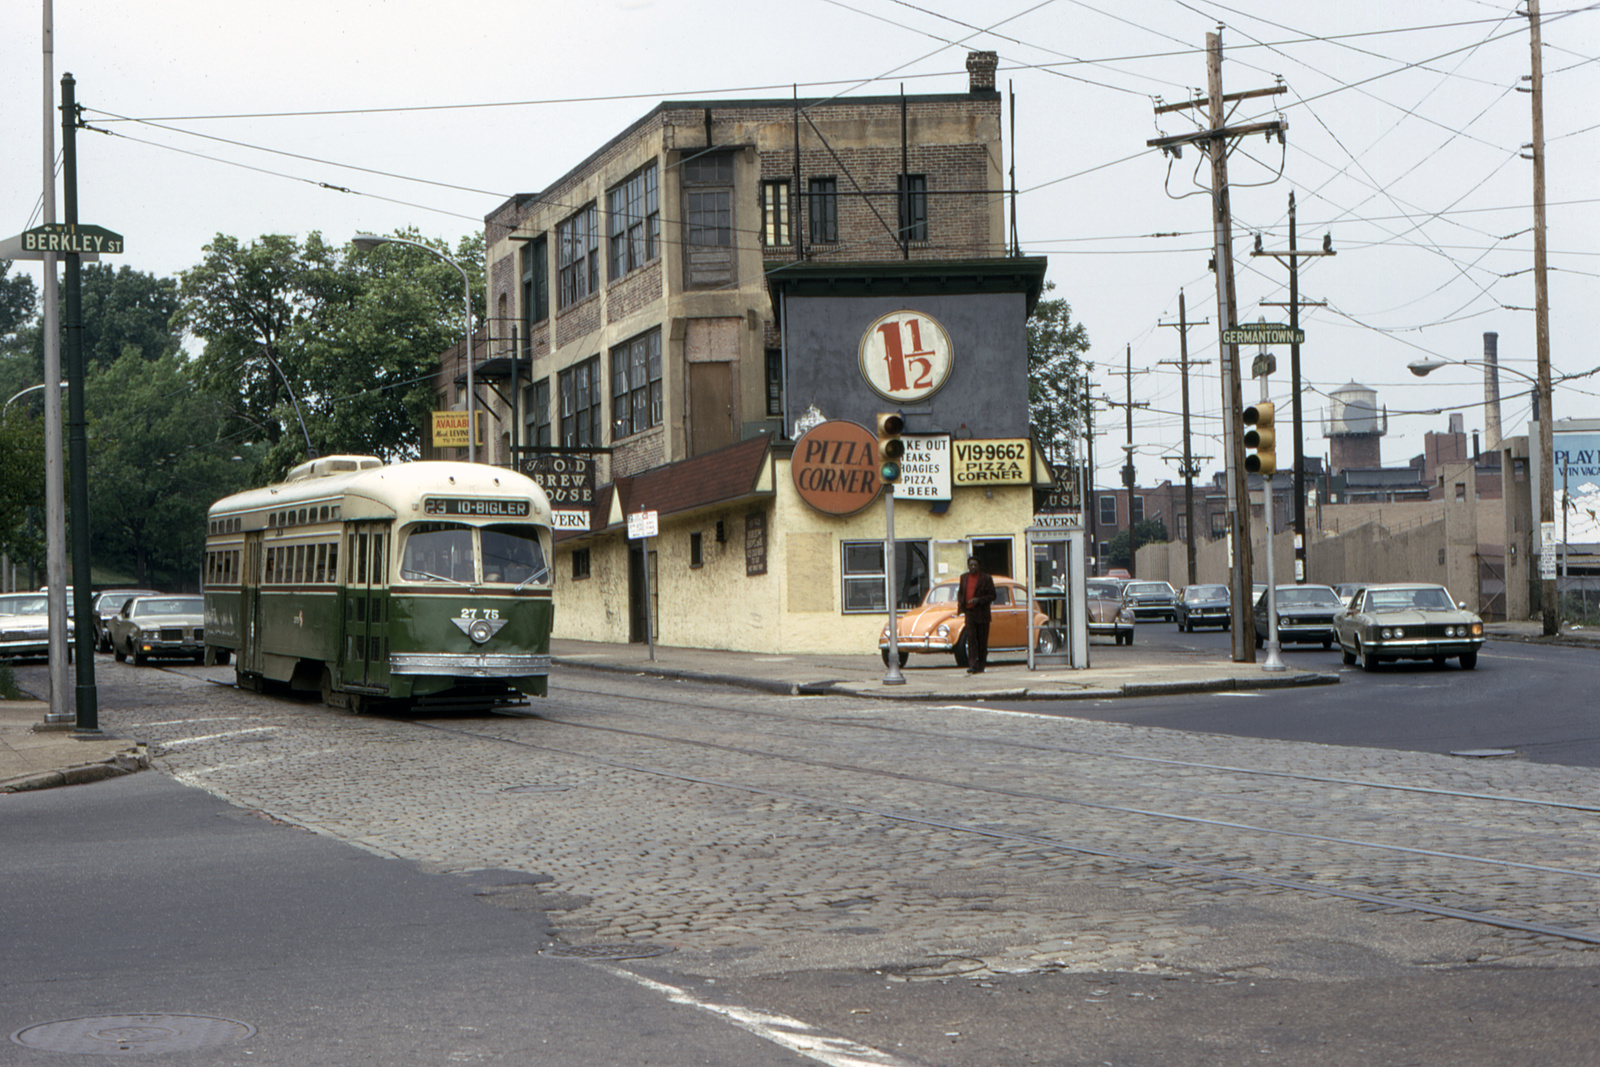 (827k, 1600x1067)<br><b>Country:</b> United States<br><b>City:</b> Philadelphia, PA<br><b>System:</b> SEPTA (or Predecessor)<br><b>Line:</b> Rt. 23-Germantown<br><b>Location:</b> Germantown/Berkley<br><b>Car:</b> PTC/SEPTA Postwar All-electric PCC (St.Louis, 1947) 2775 <br><b>Collection of:</b> David Pirmann<br><b>Date:</b> 5/1974<br><b>Viewed (this week/total):</b> 3 / 120